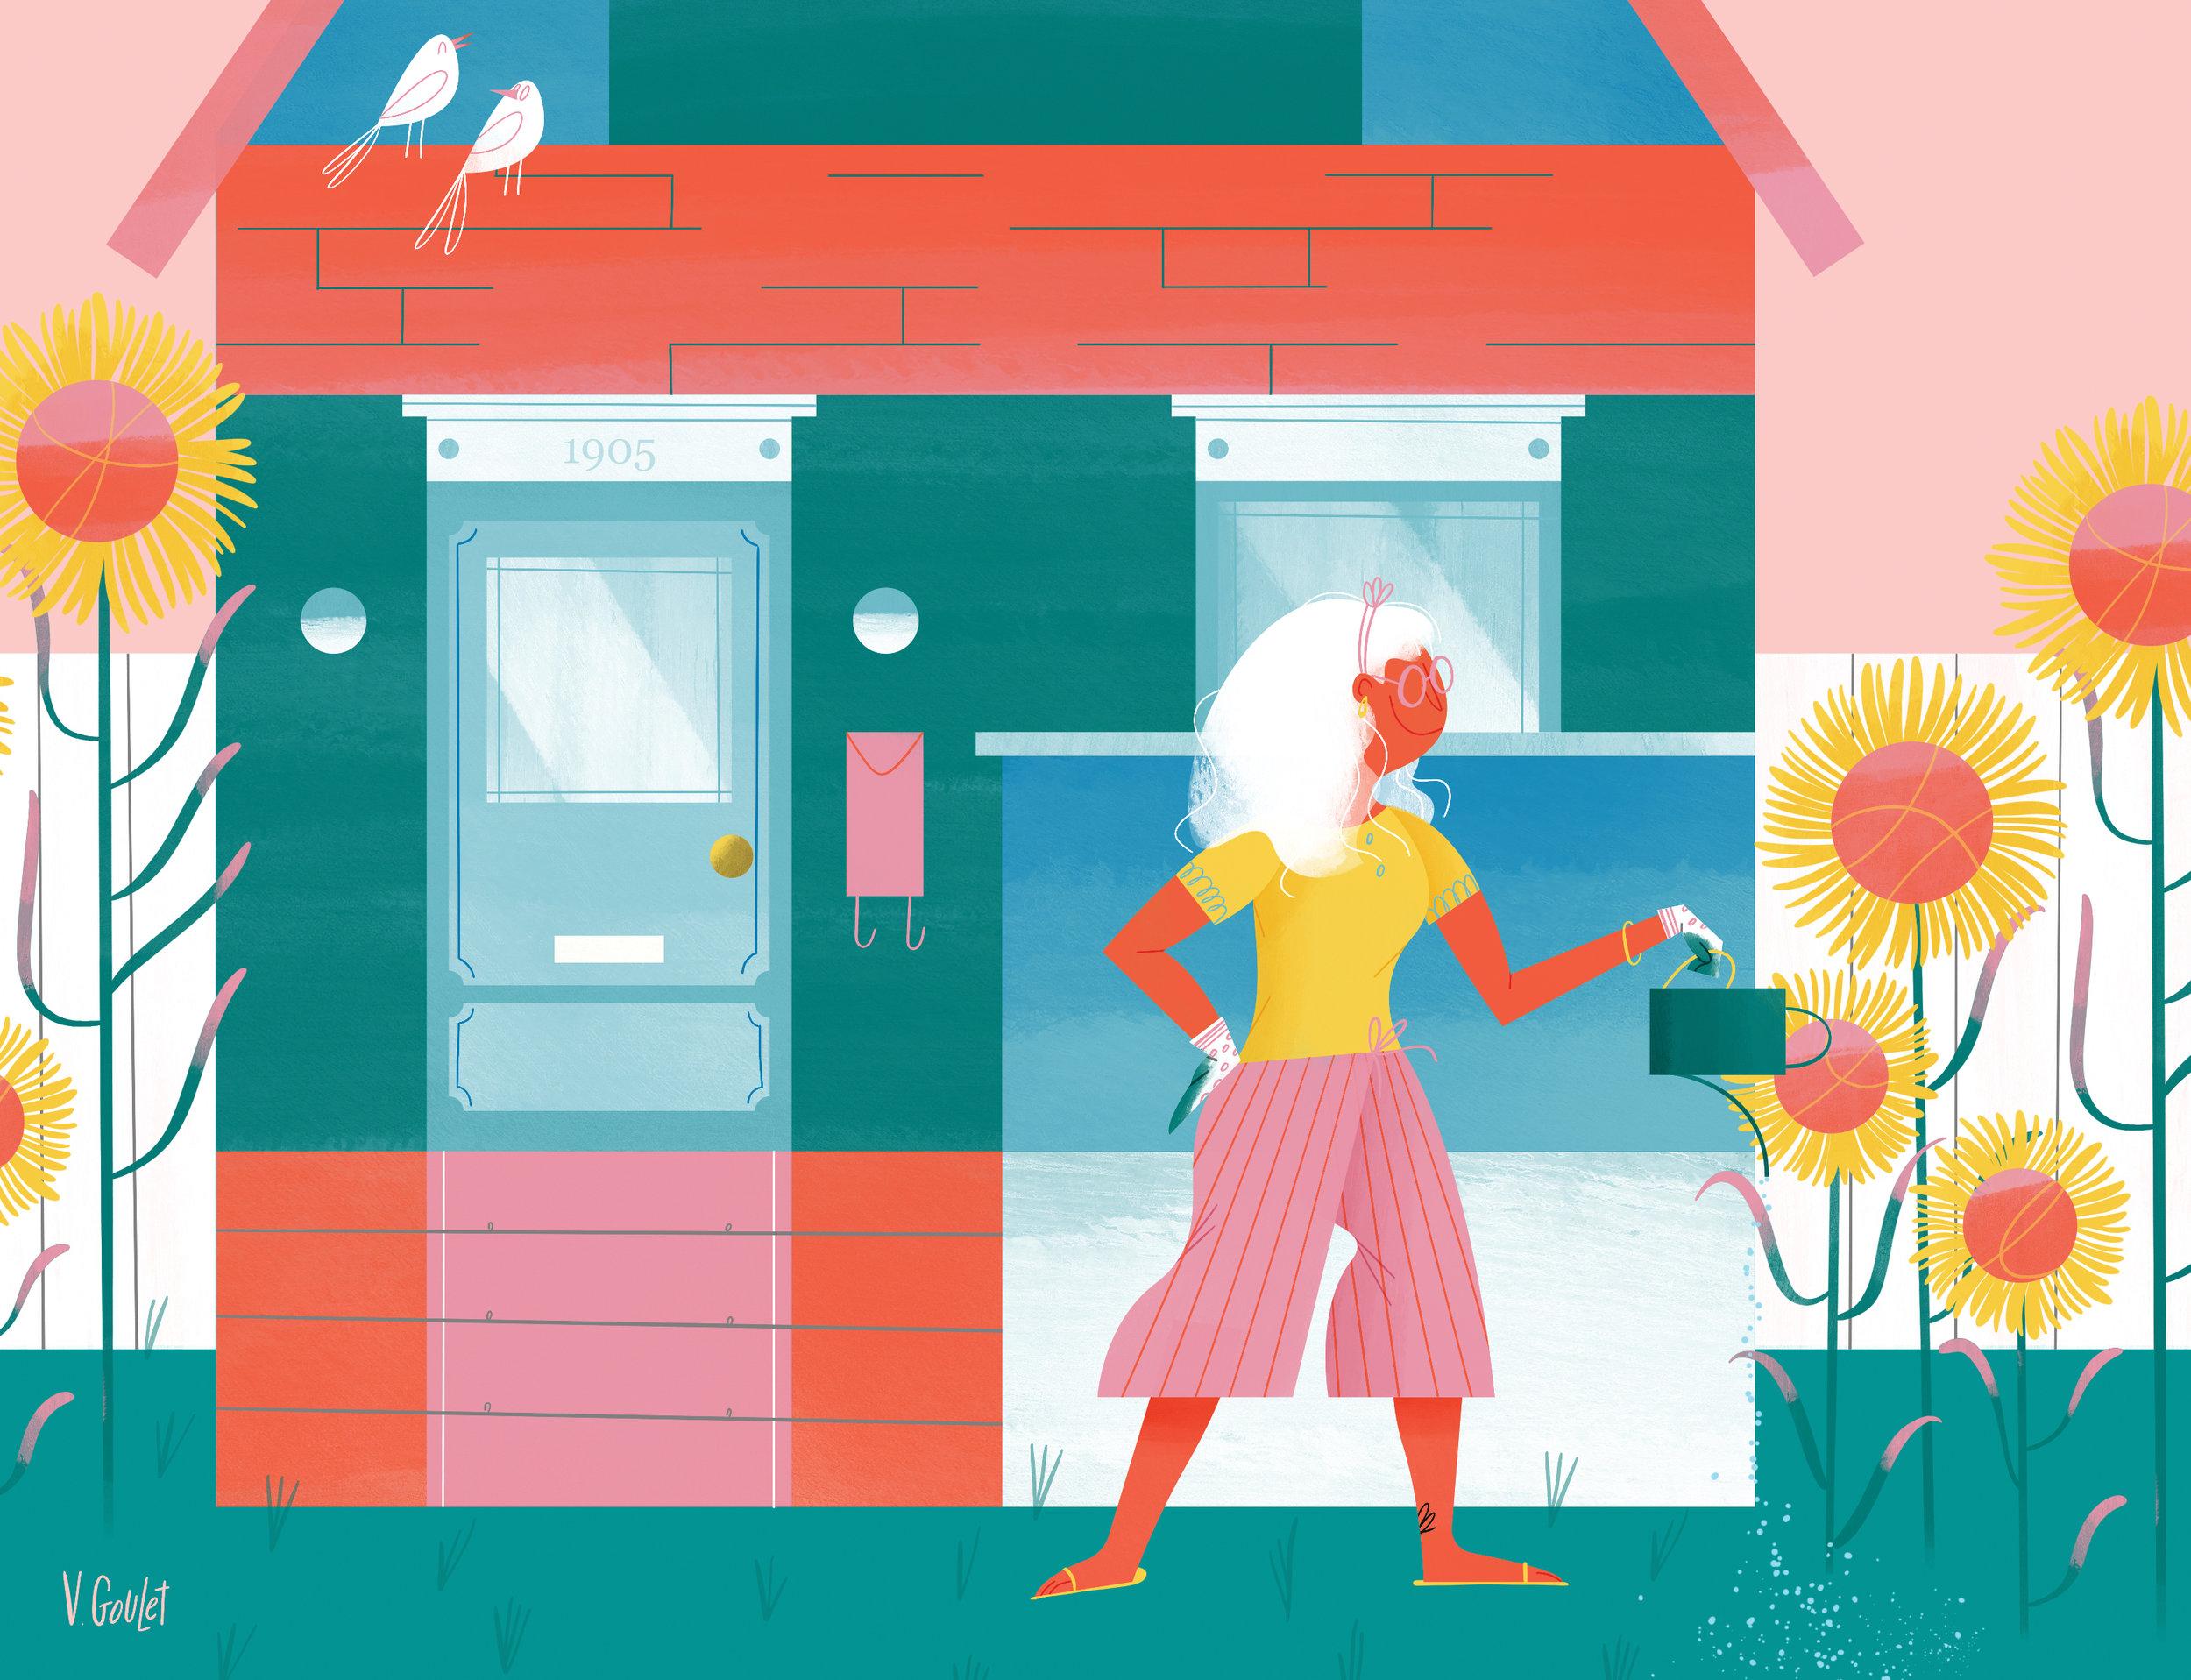 Avenue Edmonton, August 2019 - Illustration: Valéry Goulet - Art direction: Kim Larson